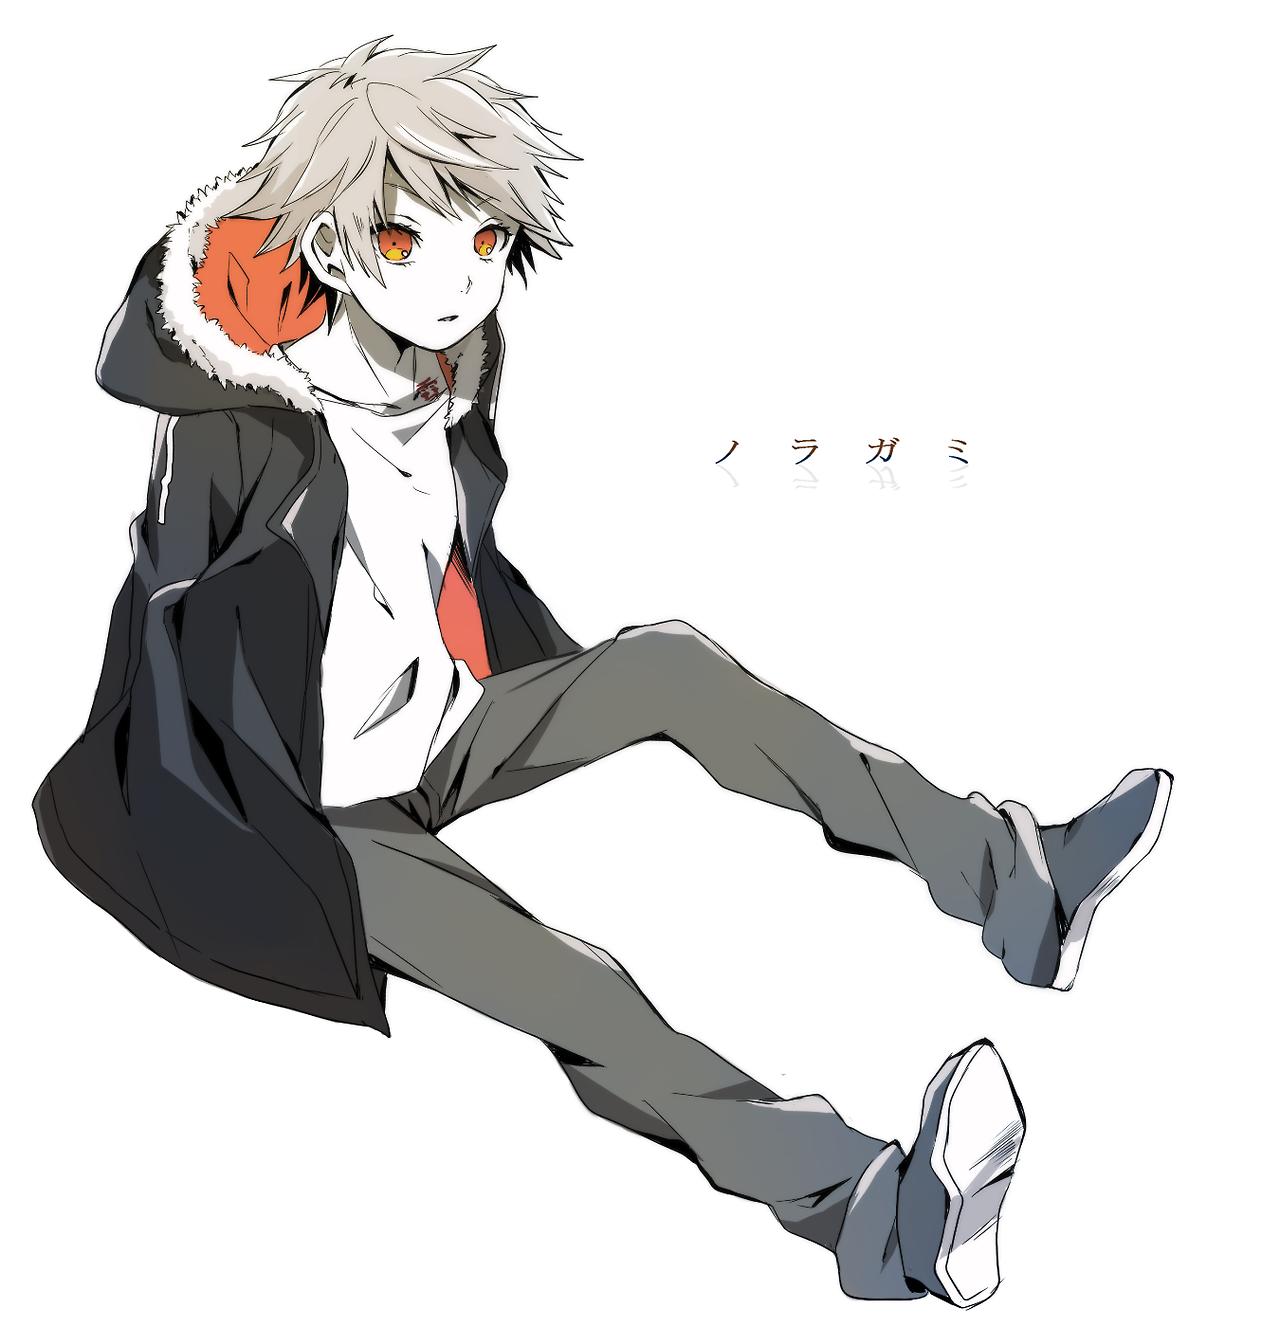 Yukine (avec images) Garçon anime, Noragami, Kawaii